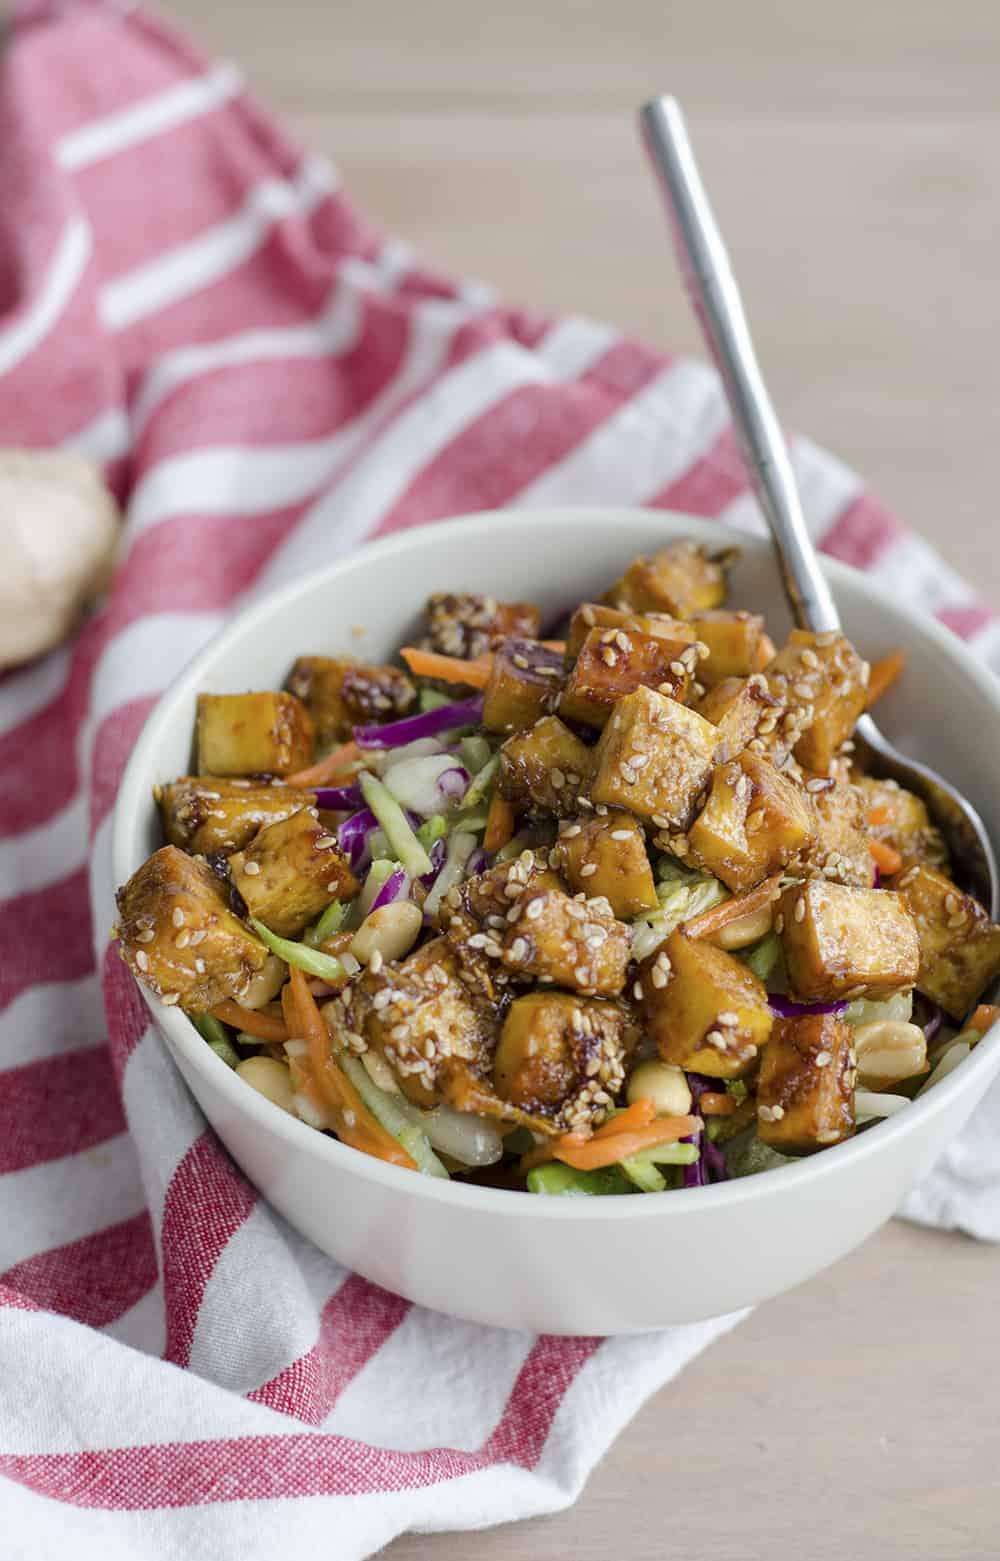 Sesame Ginger Chopped Salad! Crispy sesame-ginger tofu with Eat Smarts Ginger Bok Choy Salad greens! An easy way to enjoy a restaurant quality salad at home. Vegan and Vegetarian | www.delishknowledge.com